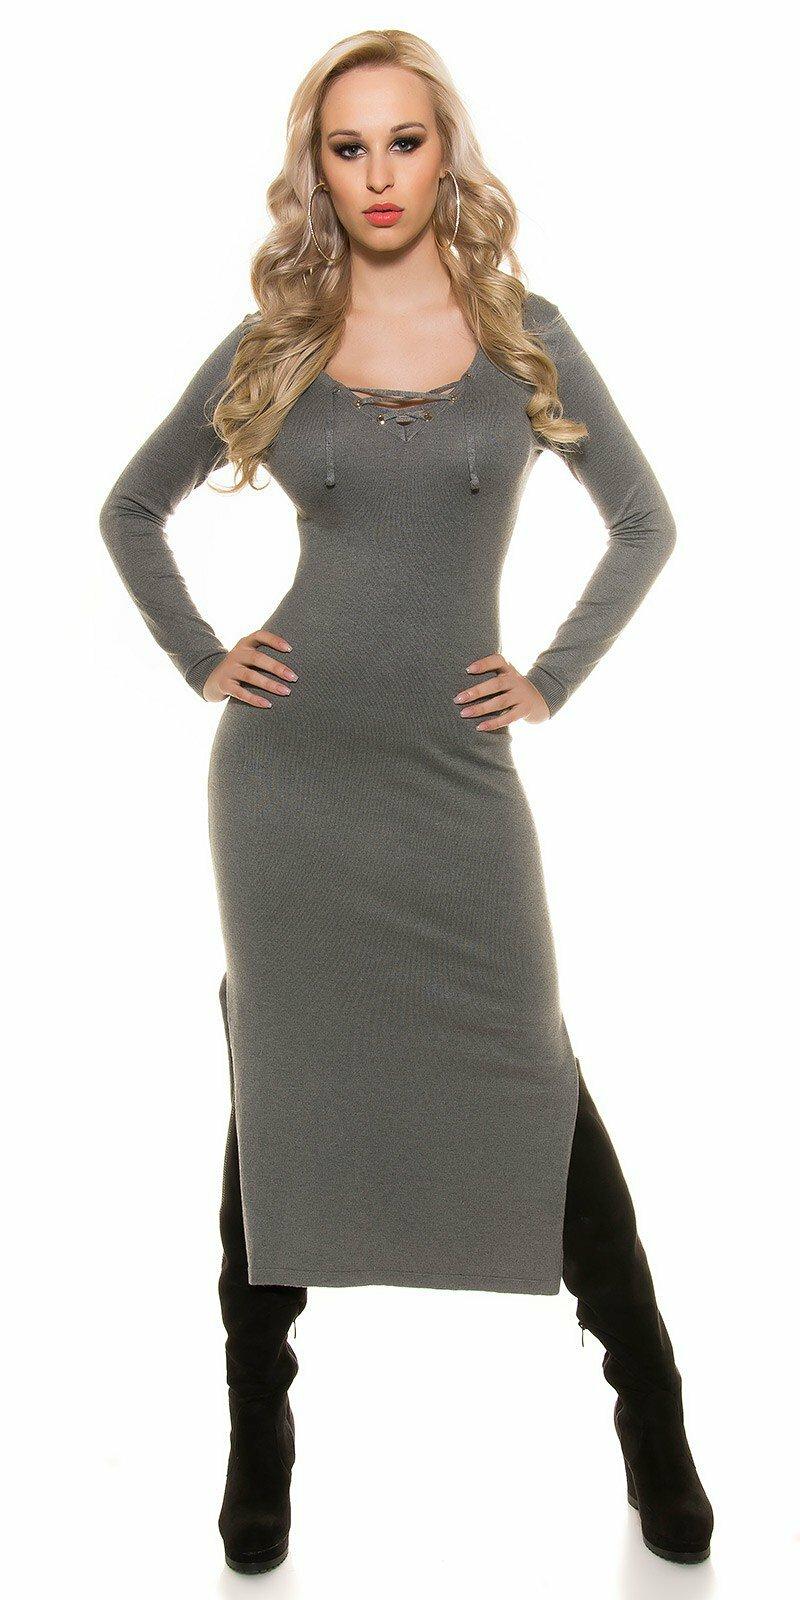 a969b2b2199b Dámske pletené maxi šaty s kapucňou KouCla  Veľkosť Univerzálna (XS S M